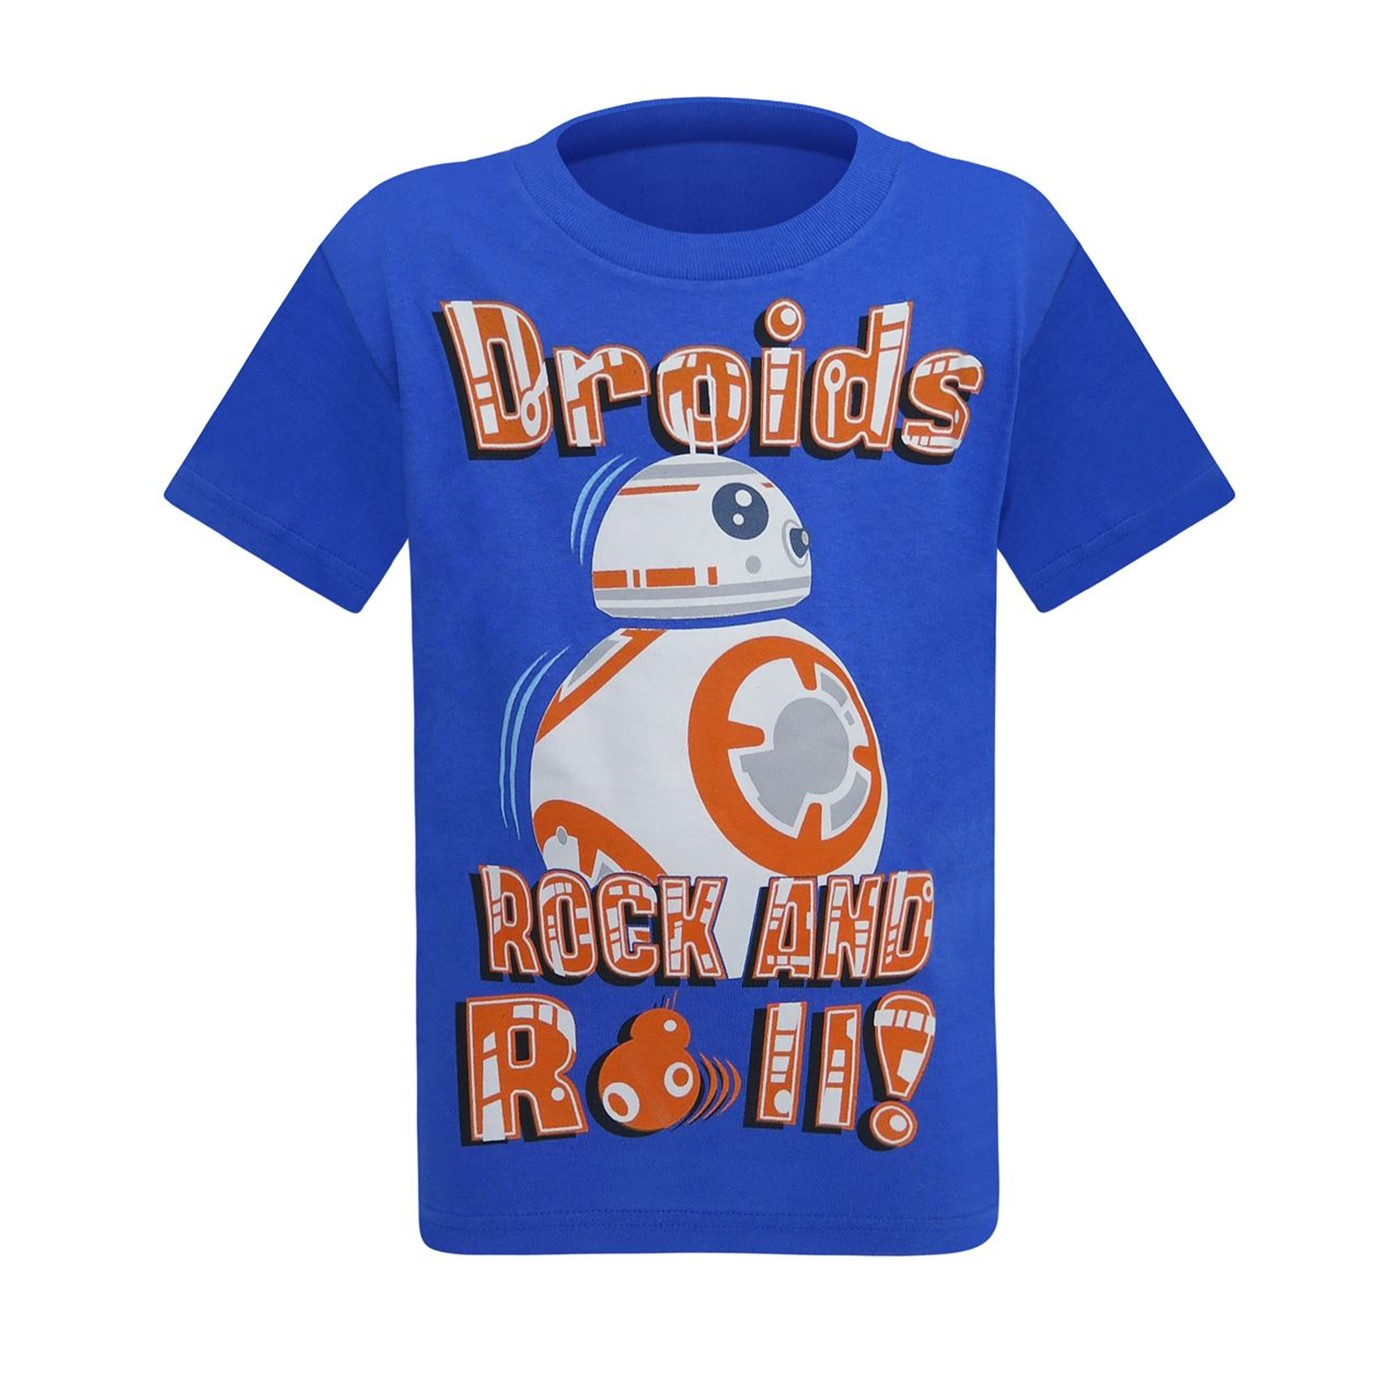 Star Wars BB-8 Droids Rock and Roll Kids T-Shirt